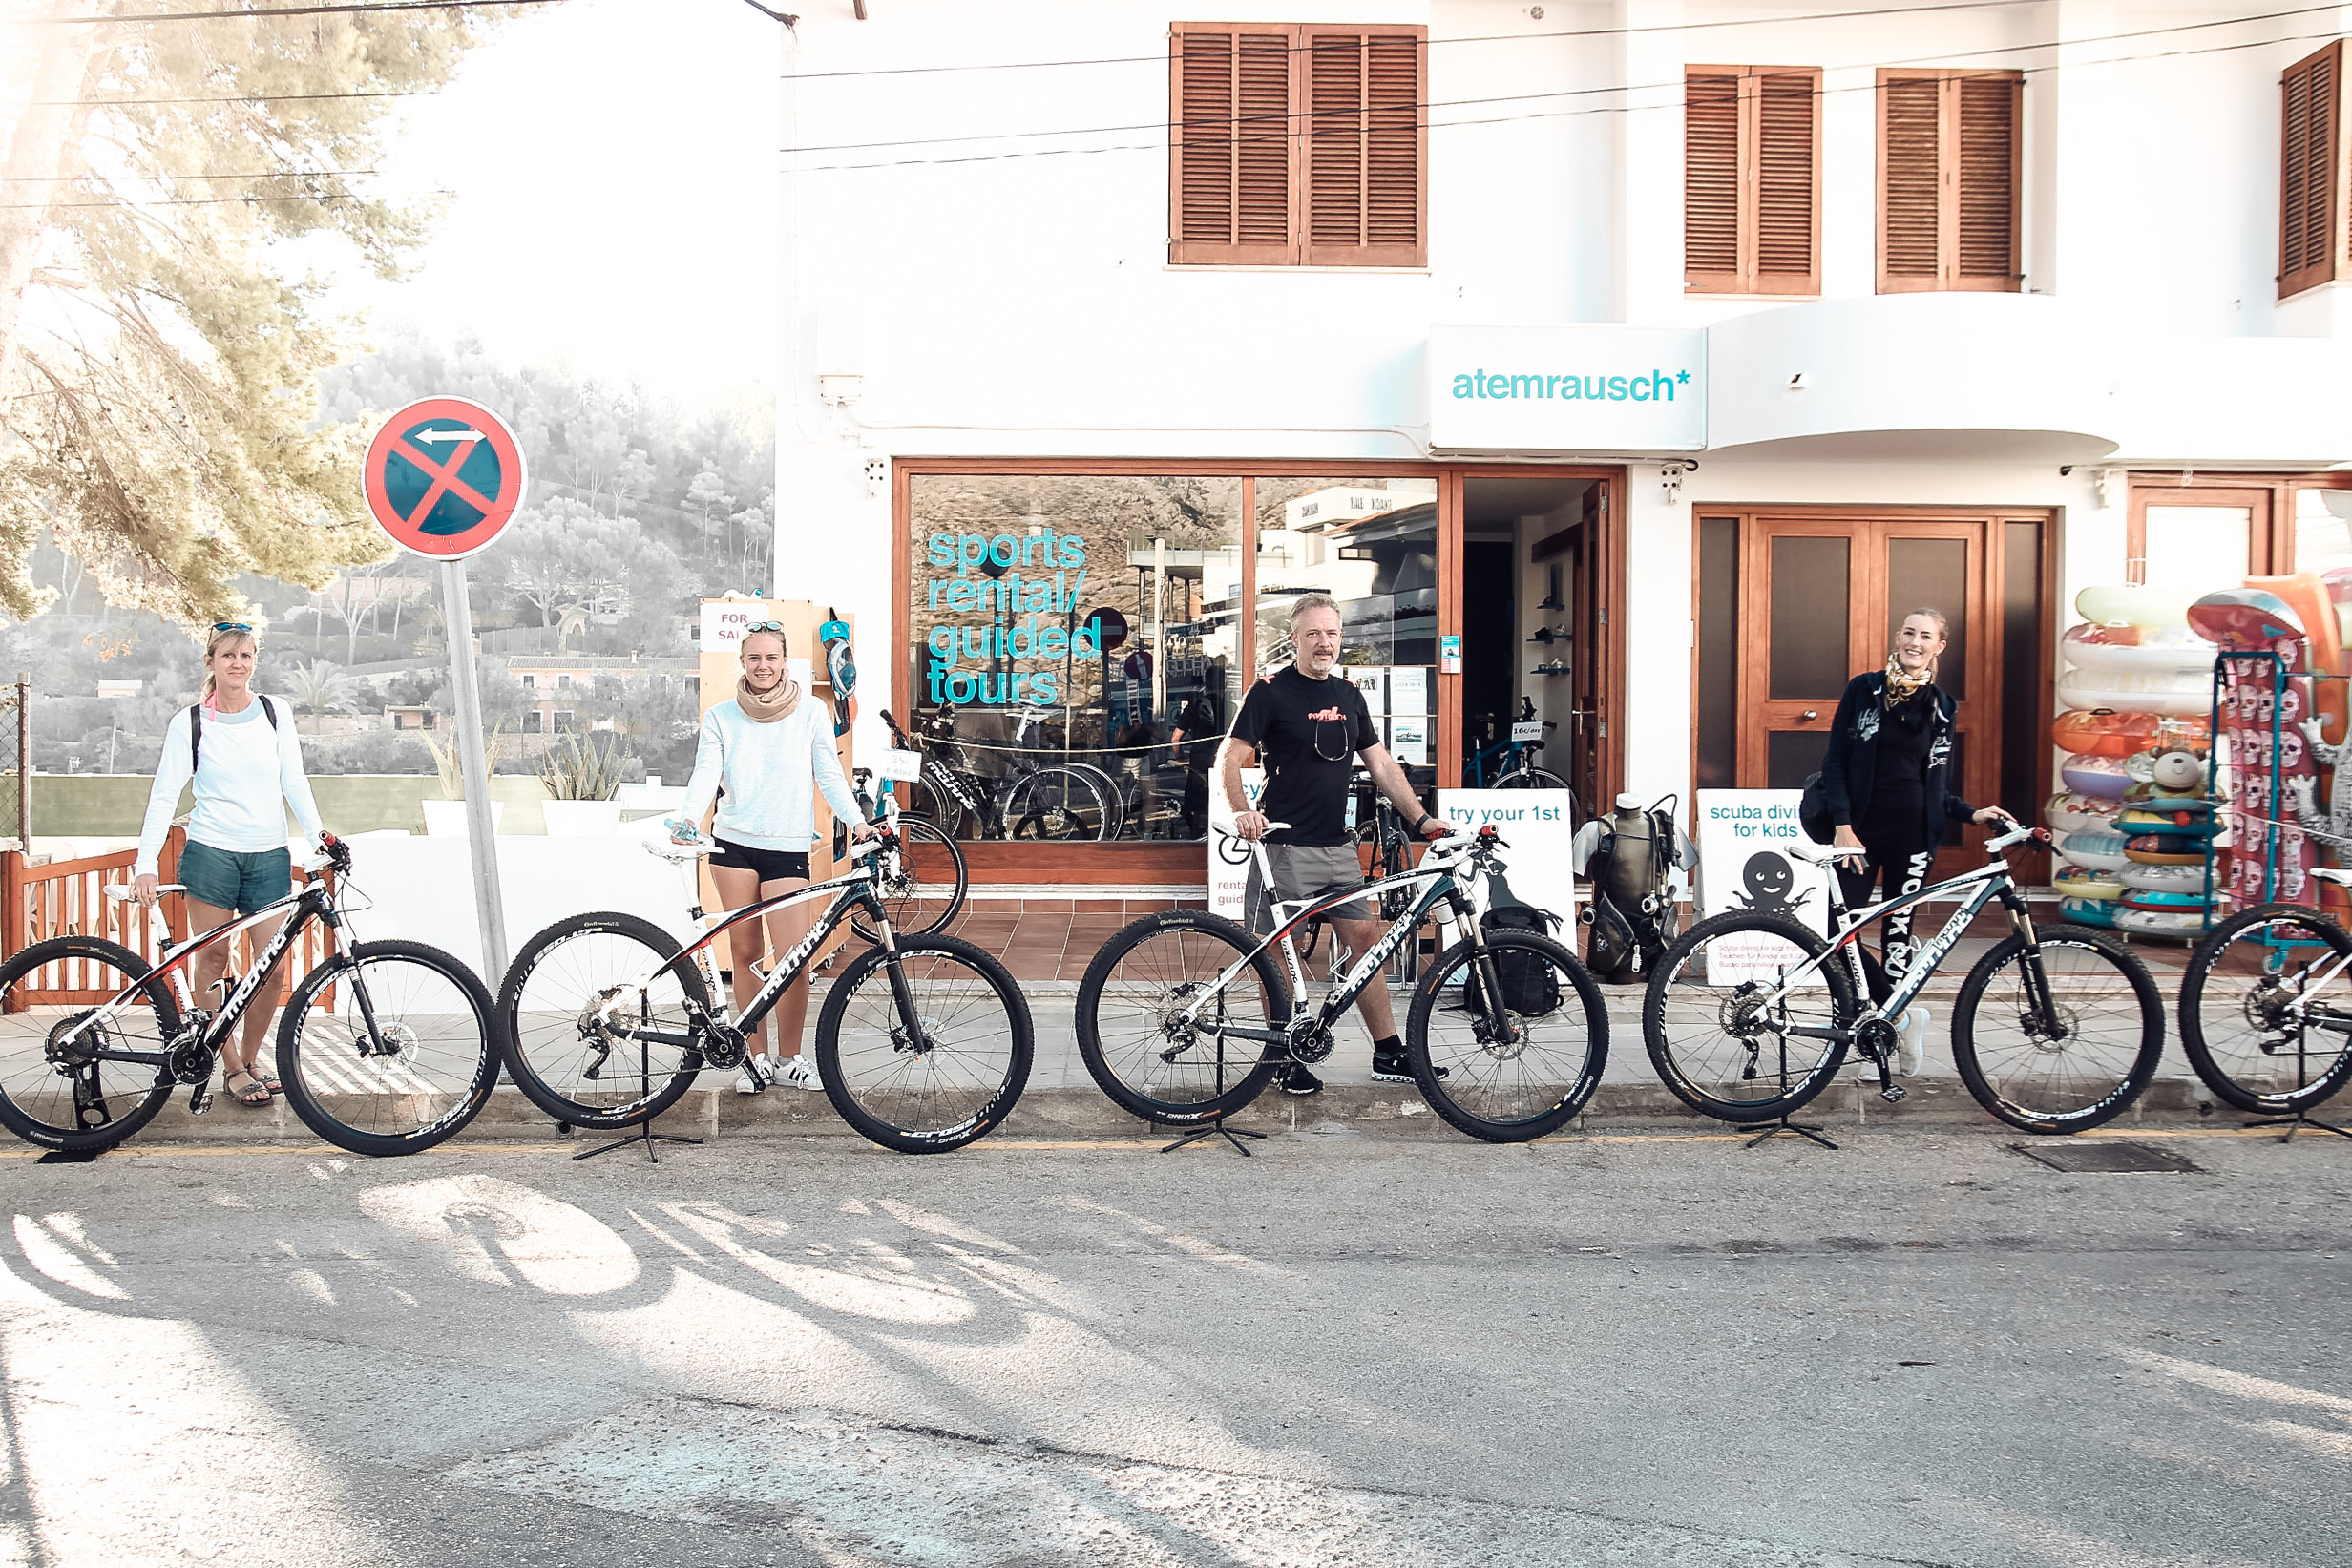 Fahrradtour mit atemrausch, organisiert von easyfinca - Reiseblogger Travelblogger Fahsionblogger Leslie Huhn